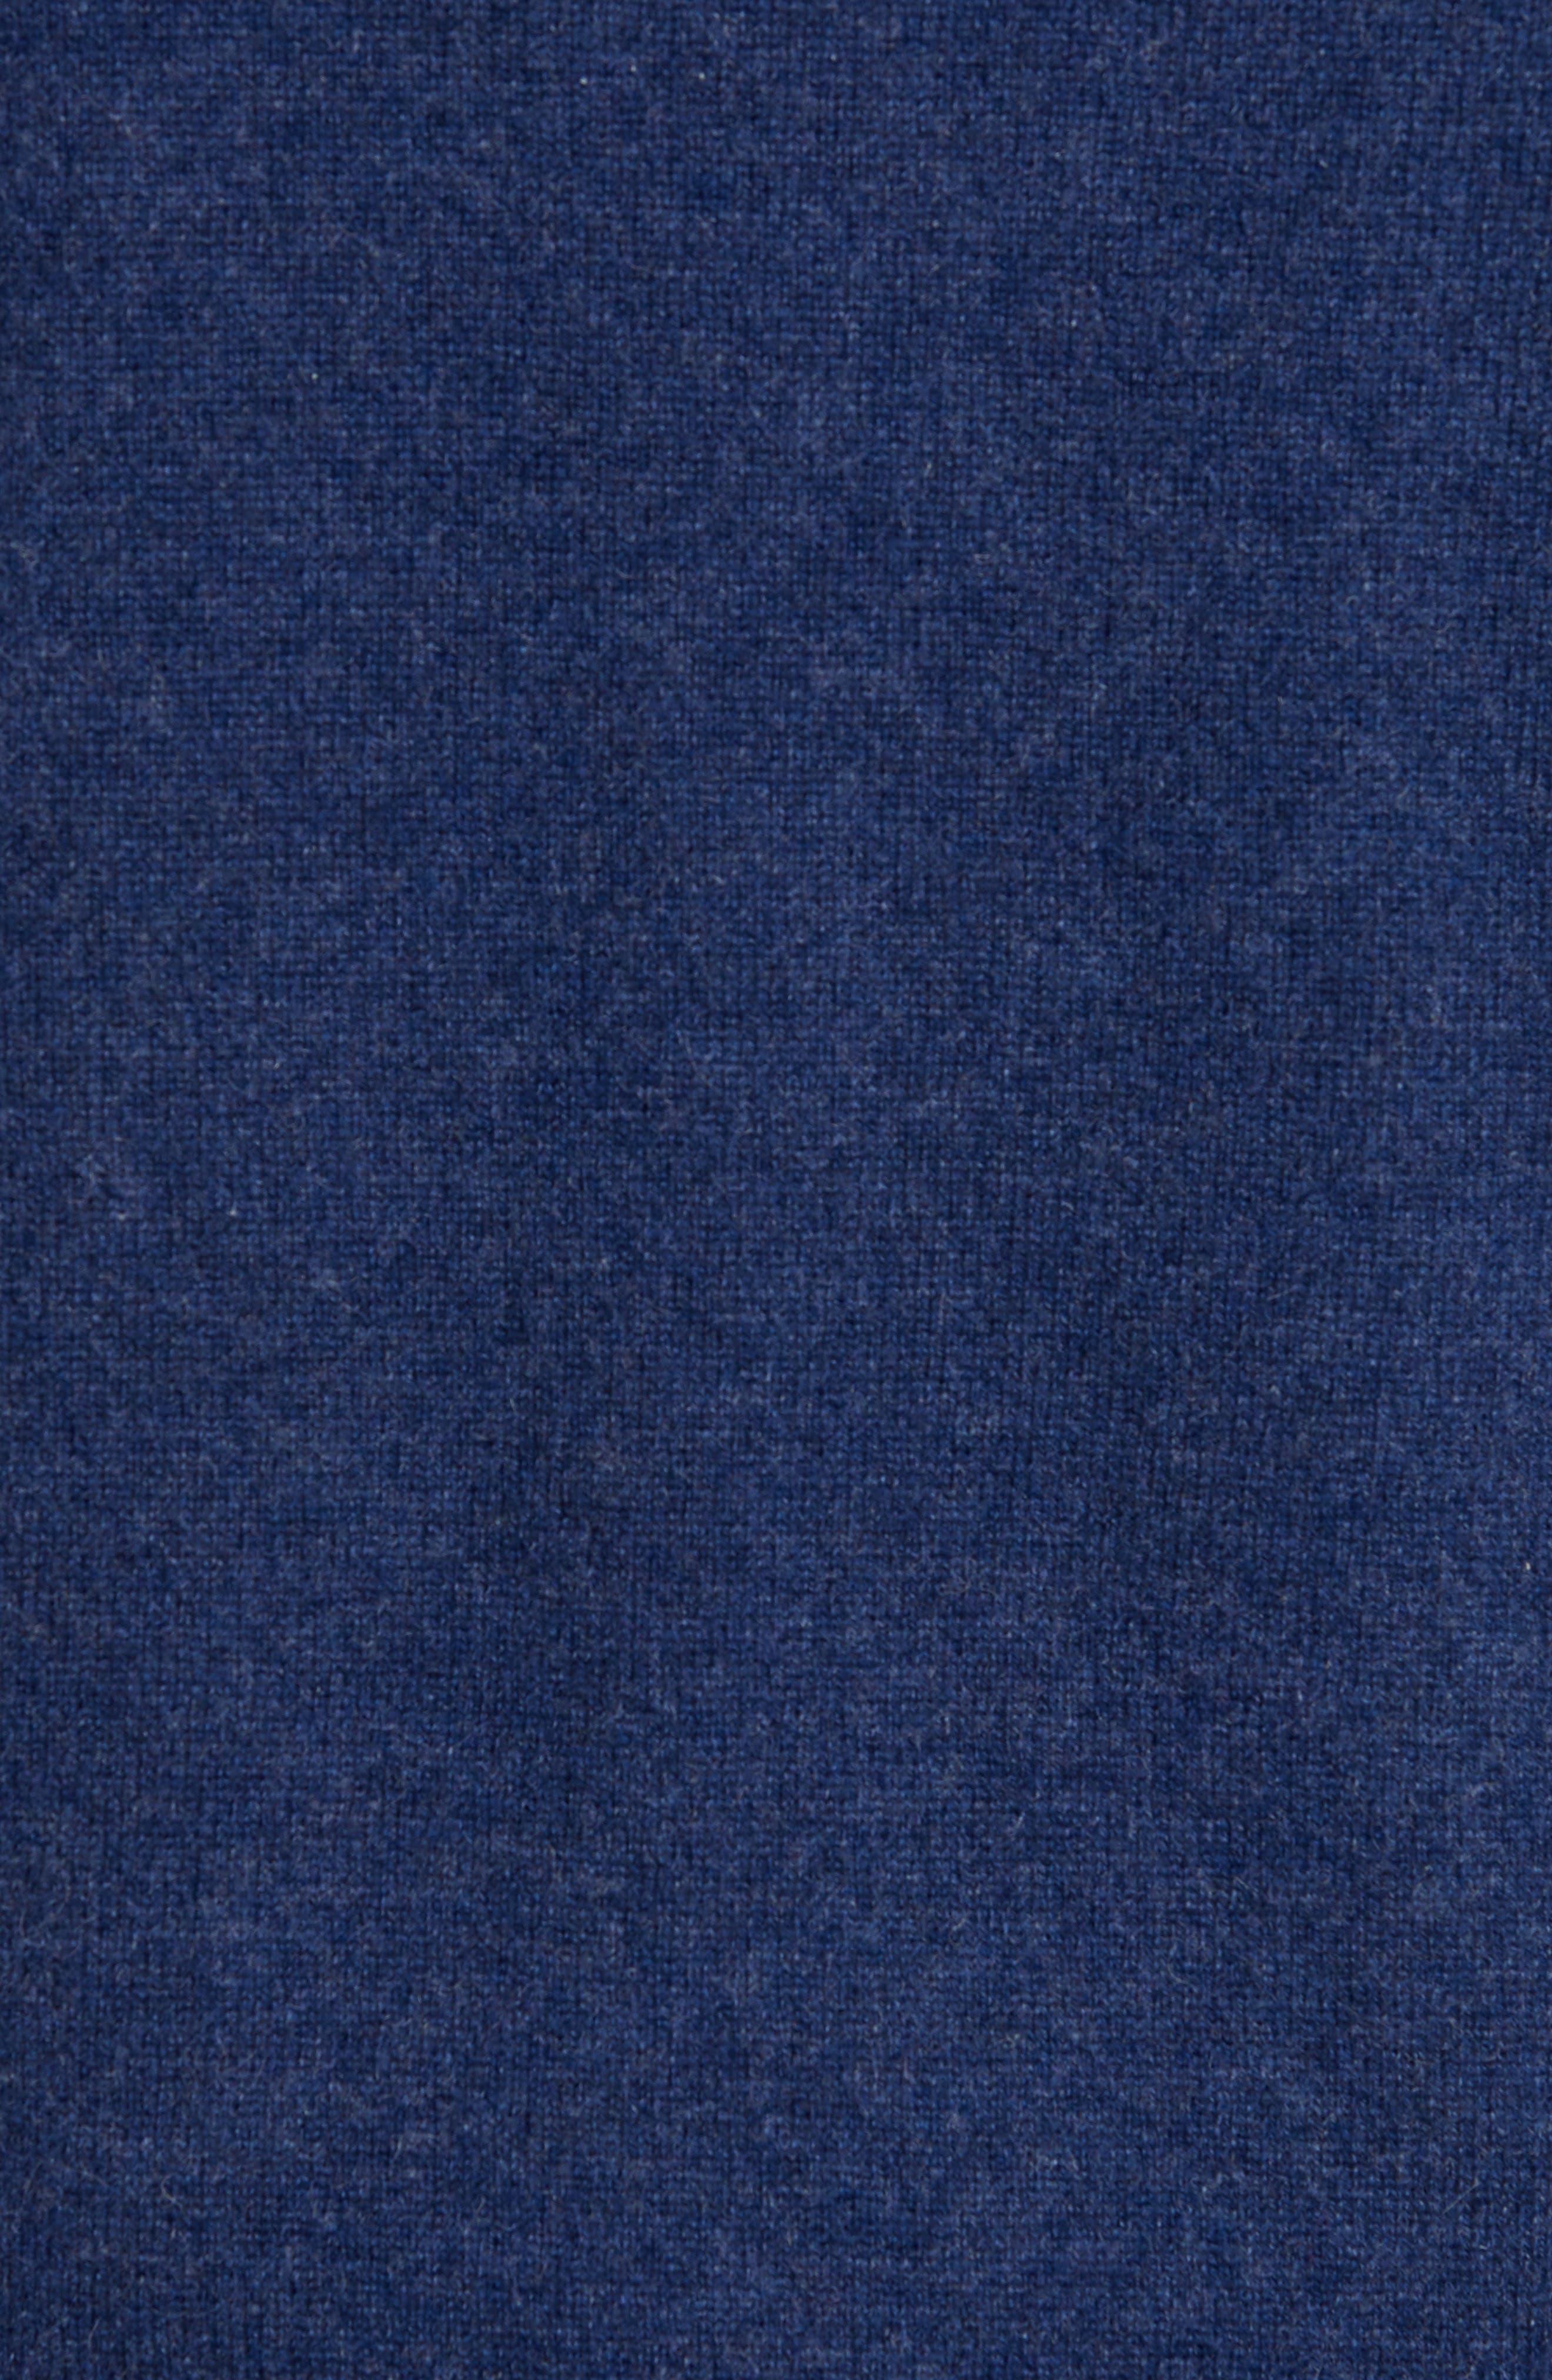 Cashmere V-Neck Sweater Vest,                             Alternate thumbnail 5, color,                             BLUE ESTATE HEATHER